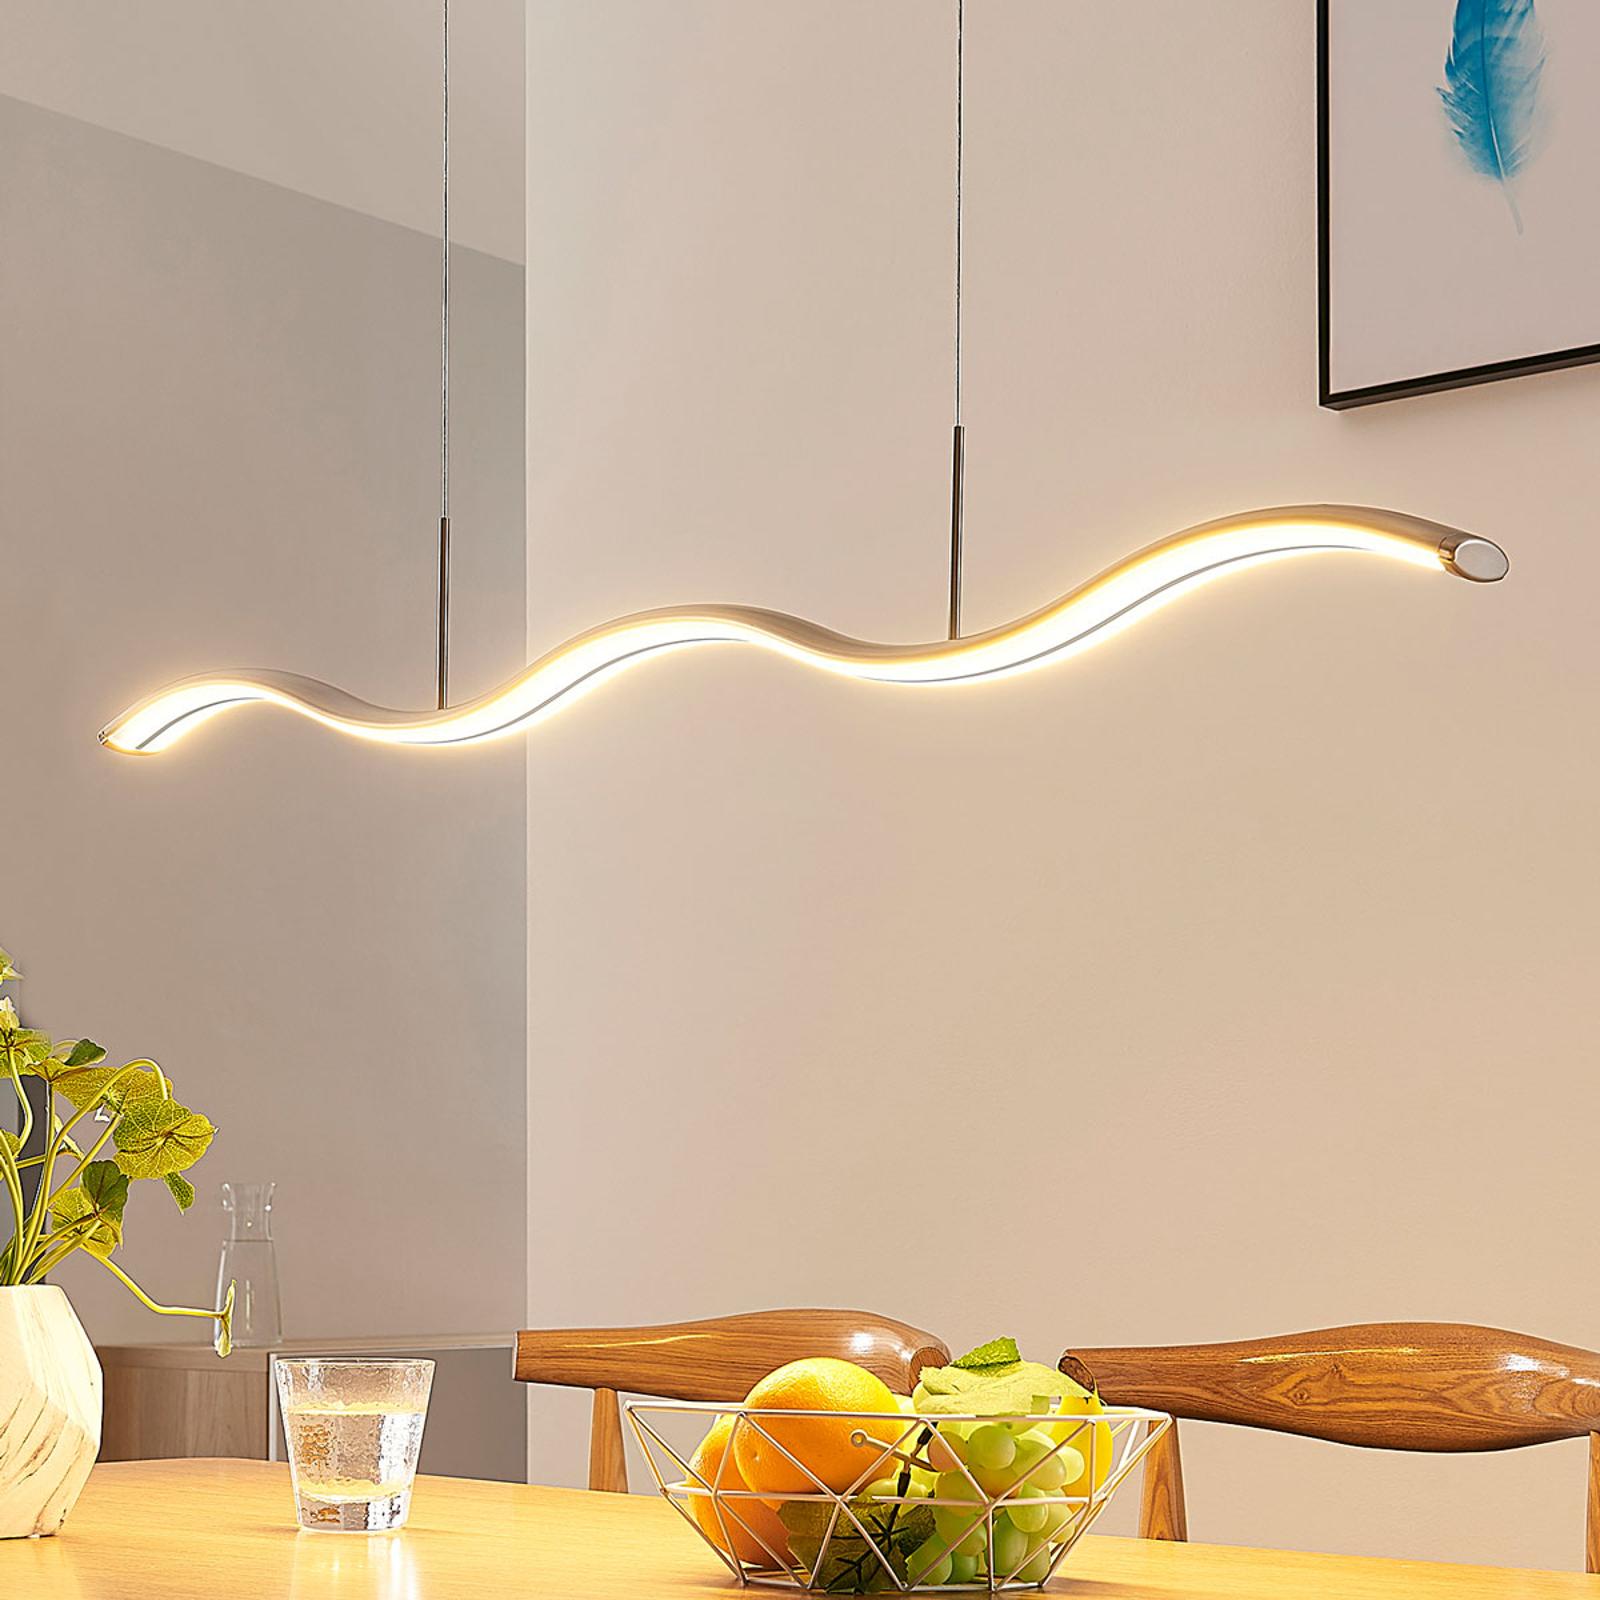 Falista lampa wisząca LED Brama